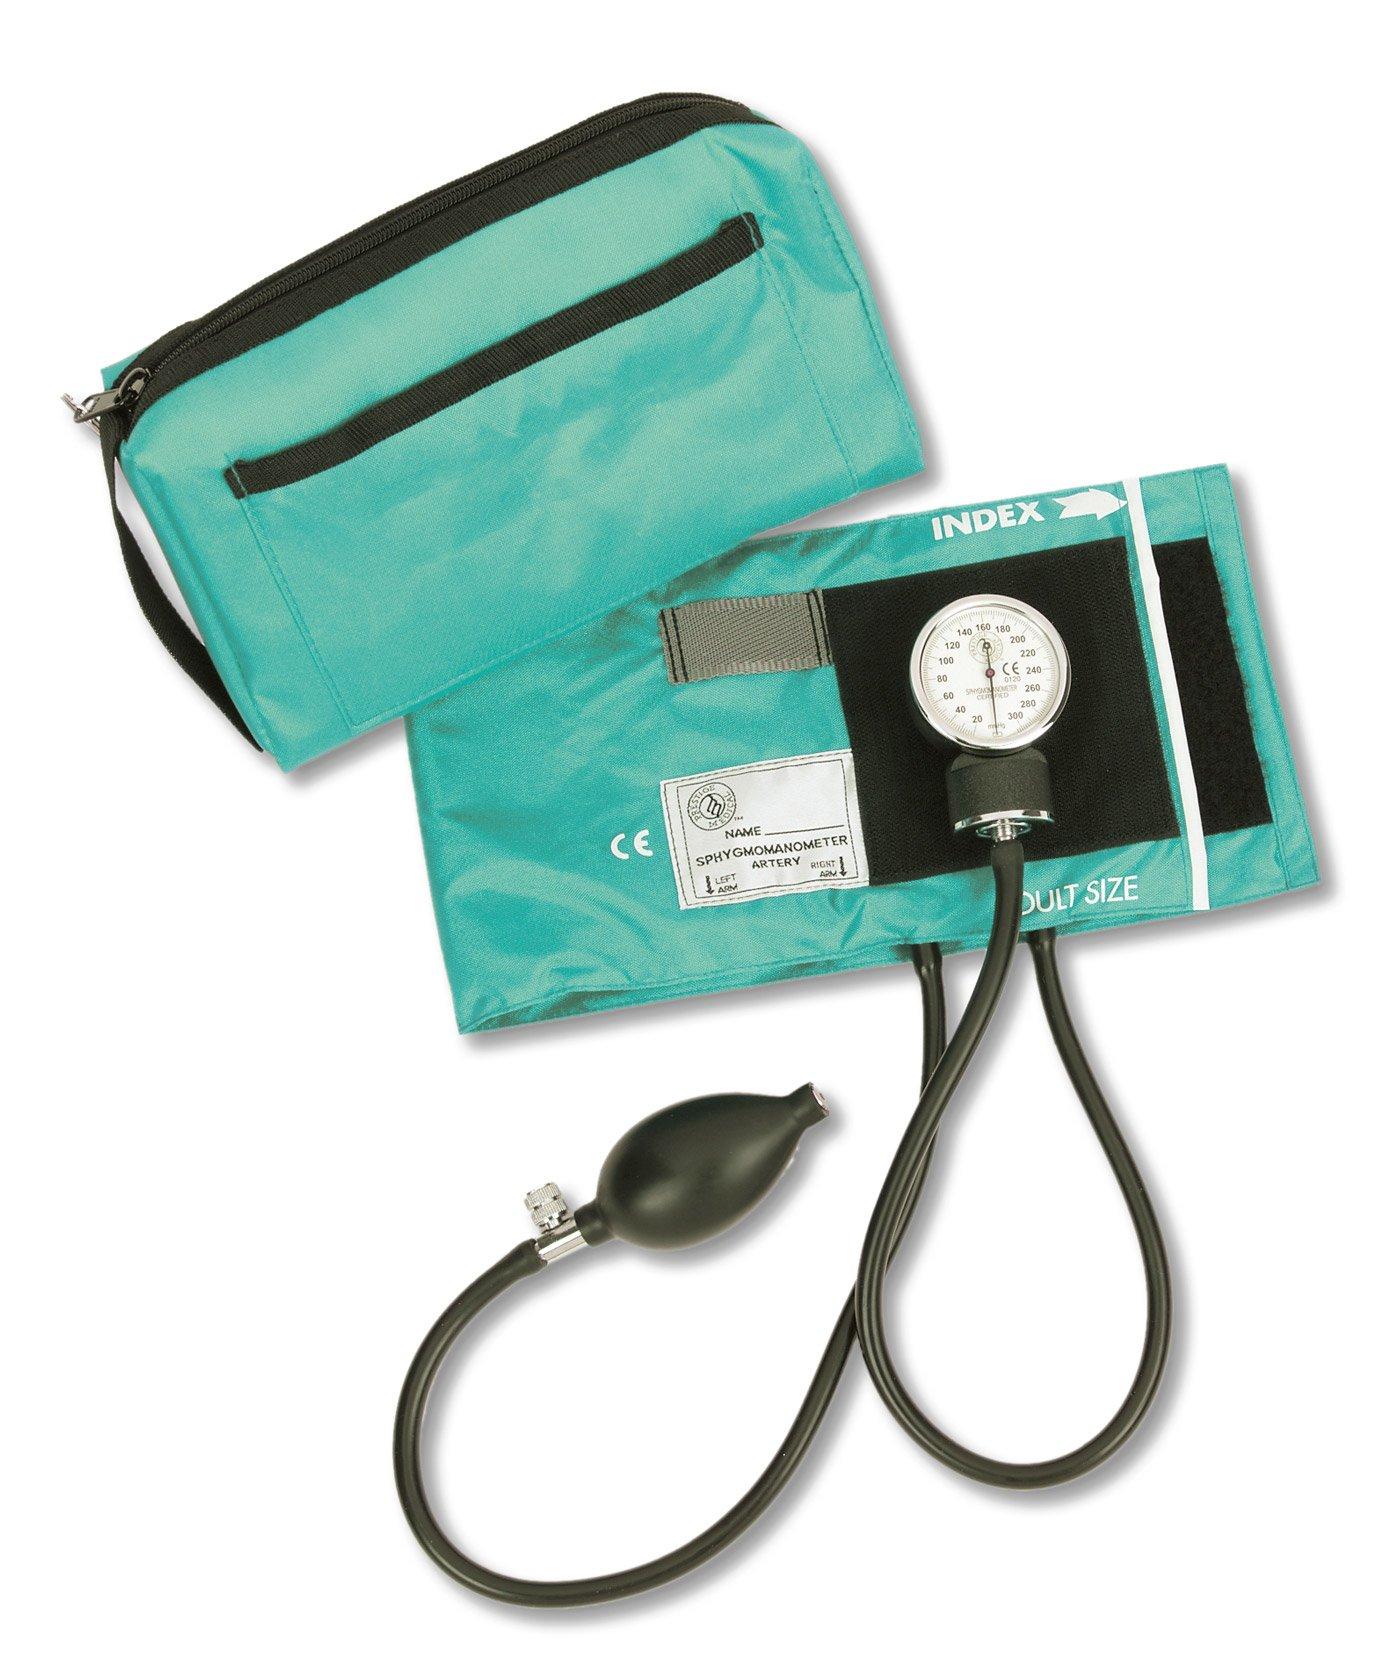 Prestige Medical Sphygmomanometer with Color Coordinated Carrying Case, Teal by Prestige Medical (Image #1)